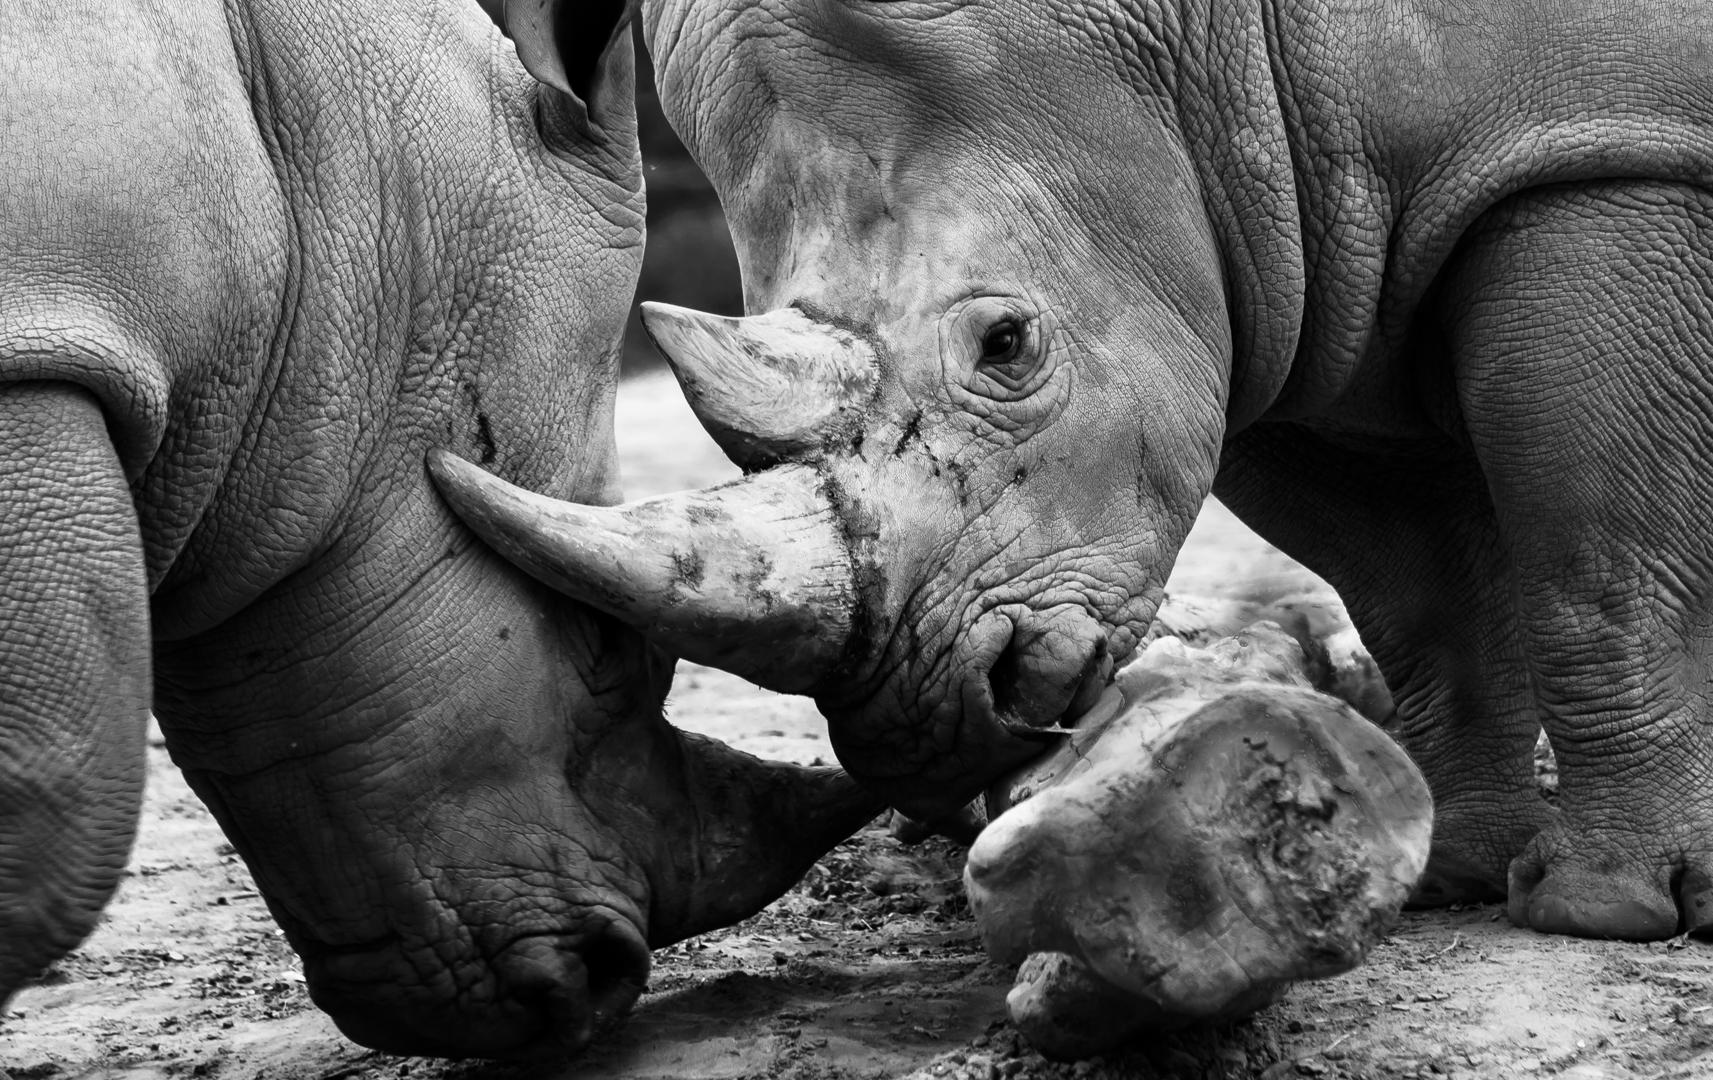 Le combat animalier